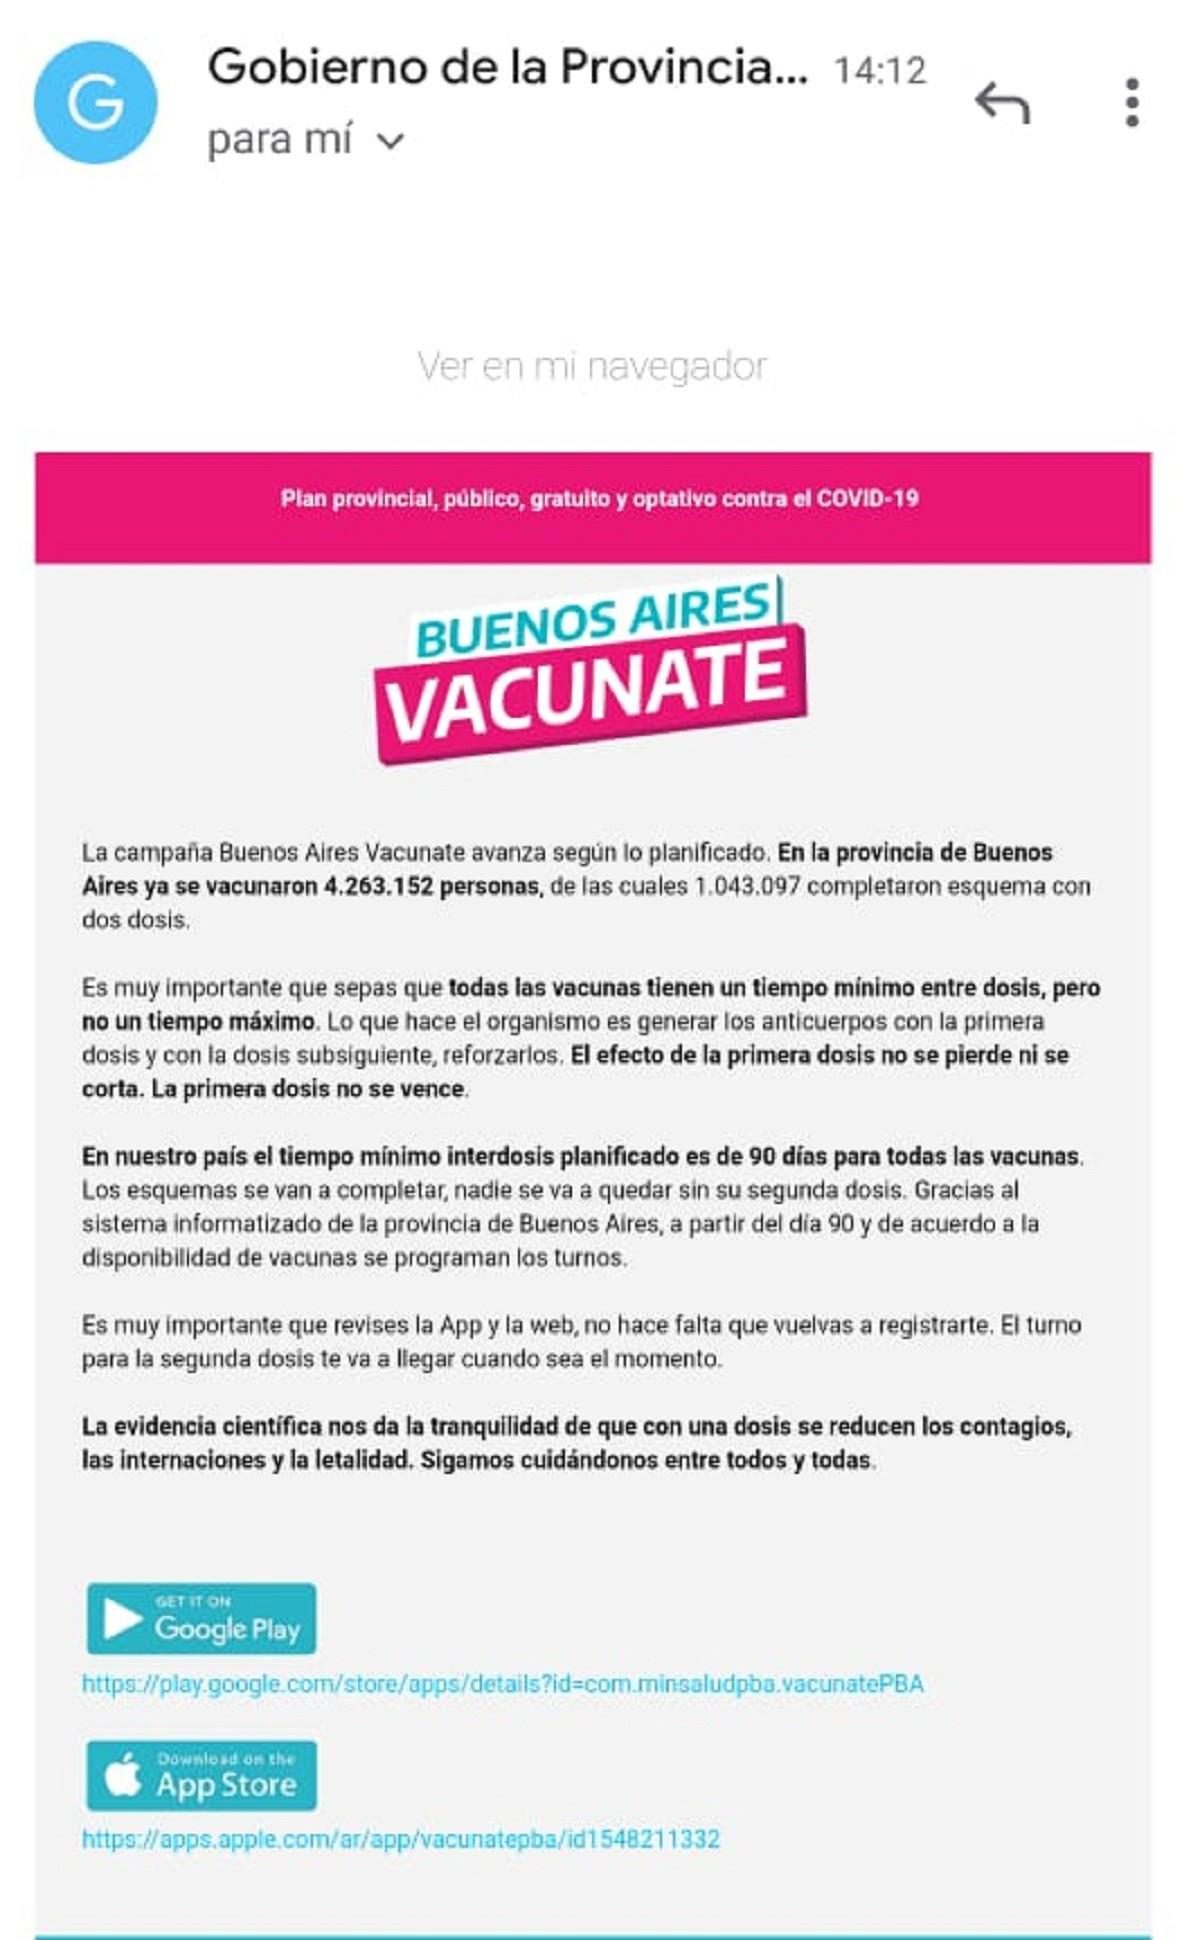 Comunicado_Vacunate.jpg